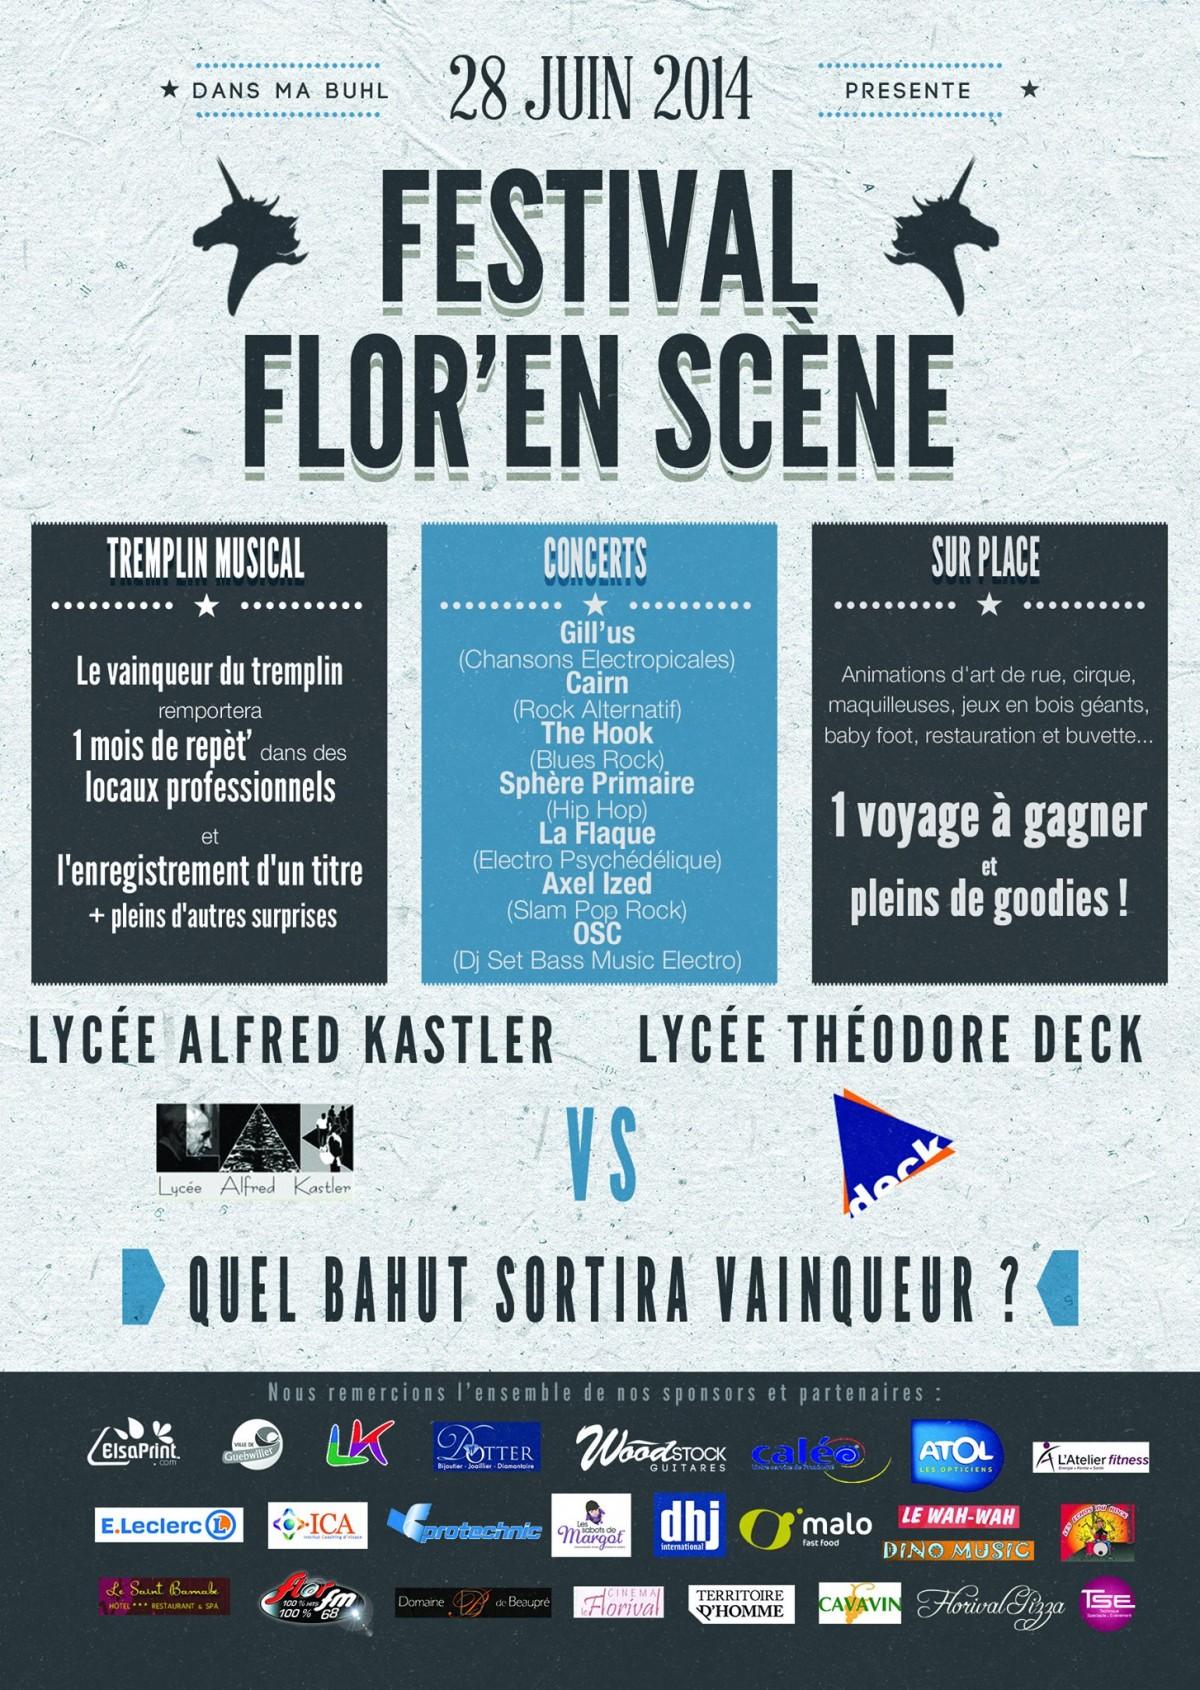 Flor' en Scène 2014